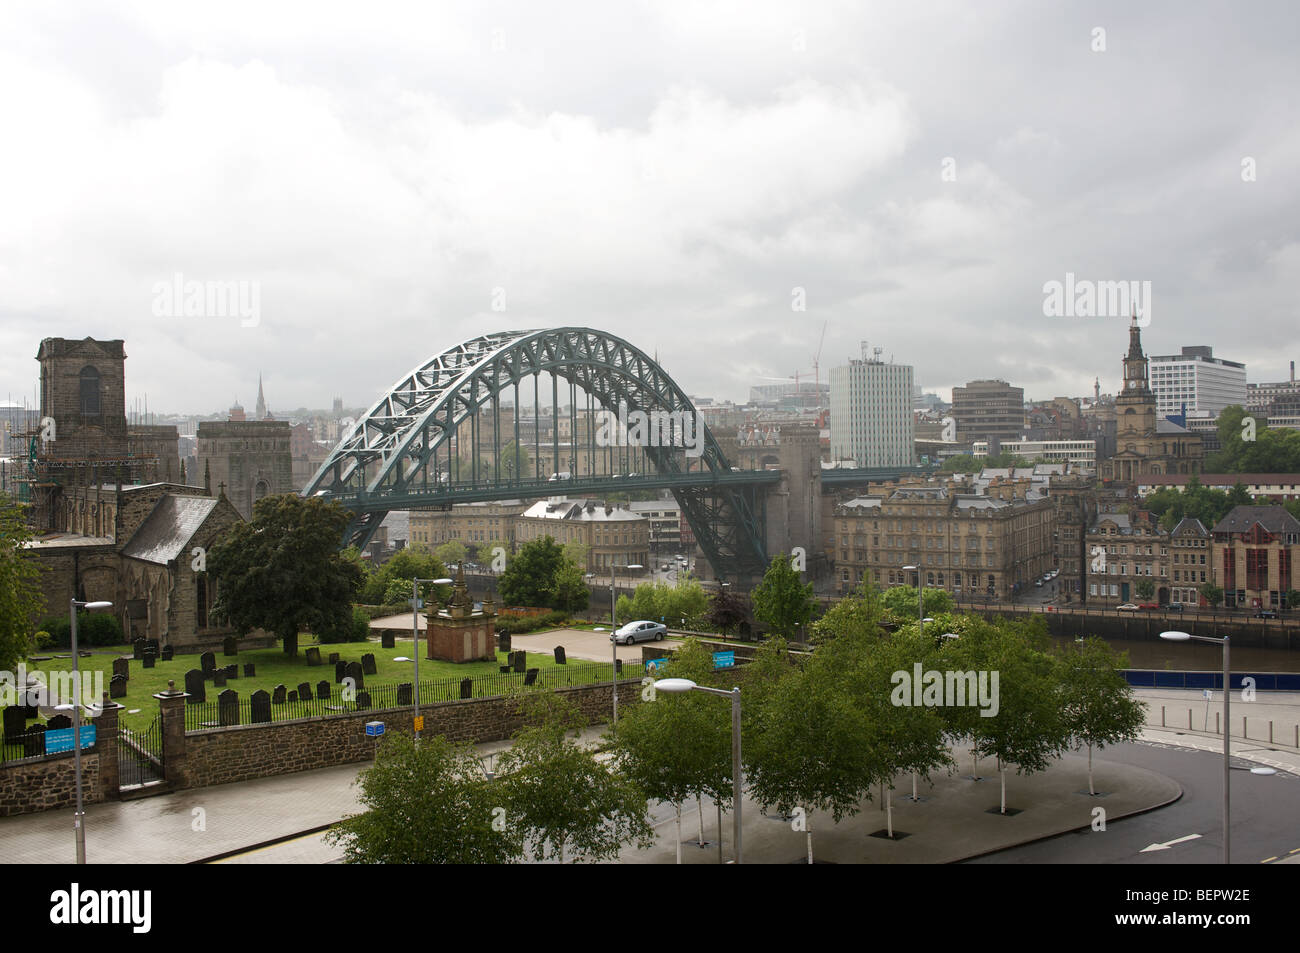 Tyne Bridge and city skyline, Newcastle upon Tyne, UK. Stock Photo